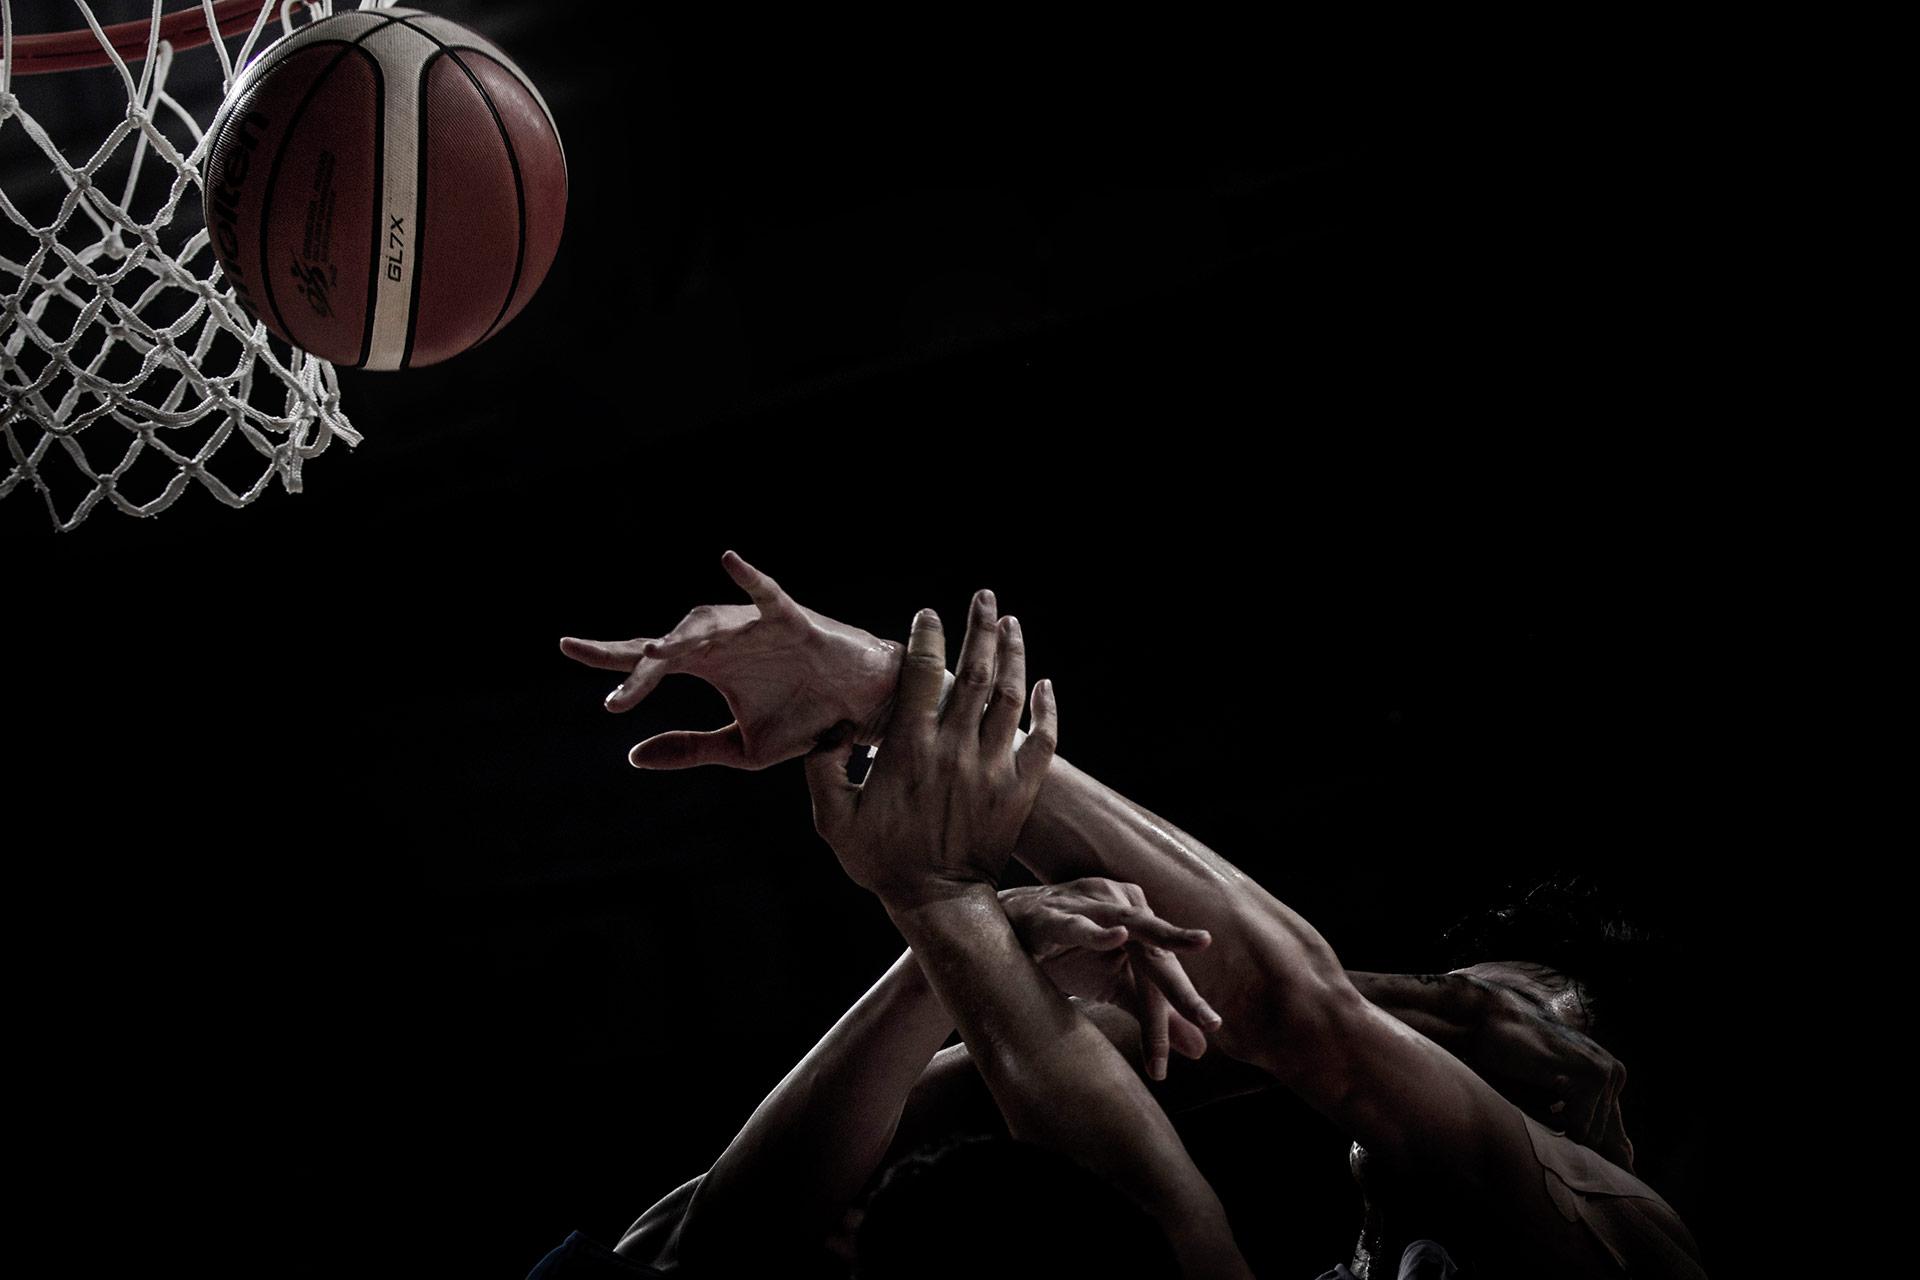 28th FIBA Asia championship 2015